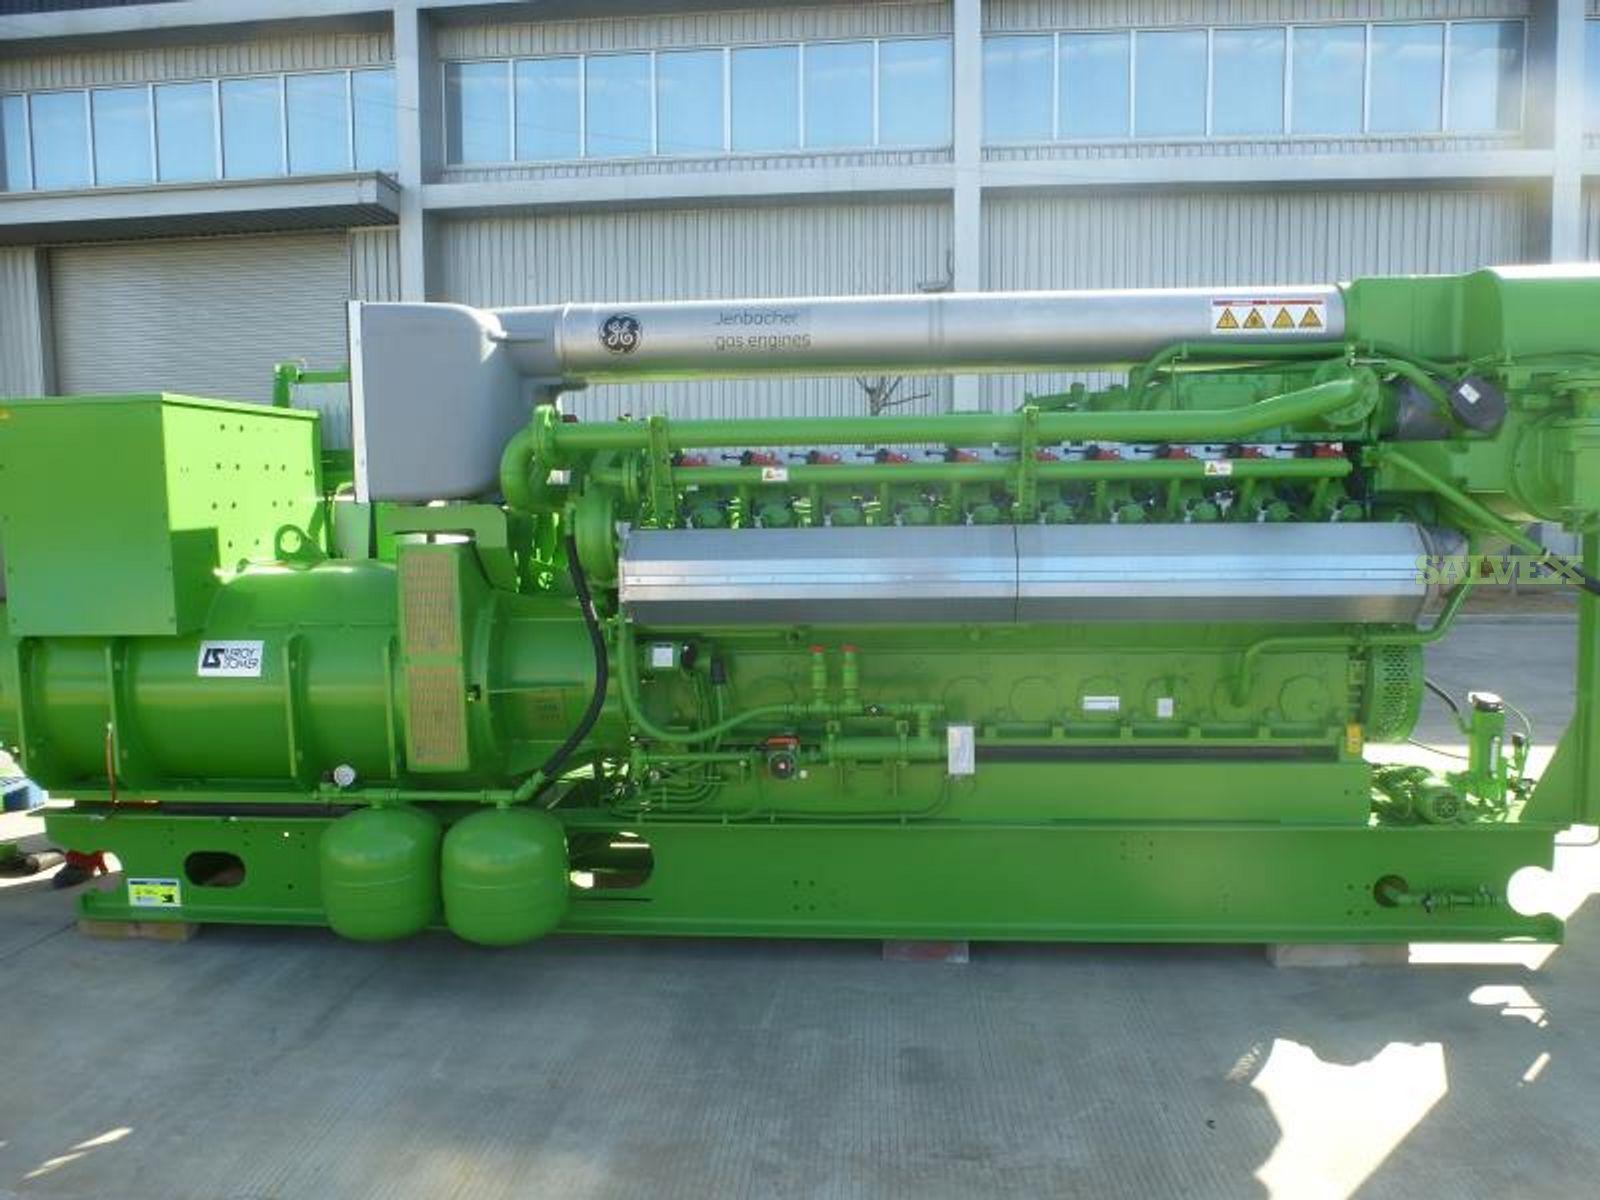 GE Jenbacher Gas Generators for Drilling Rig Power Supply(7  Generators)